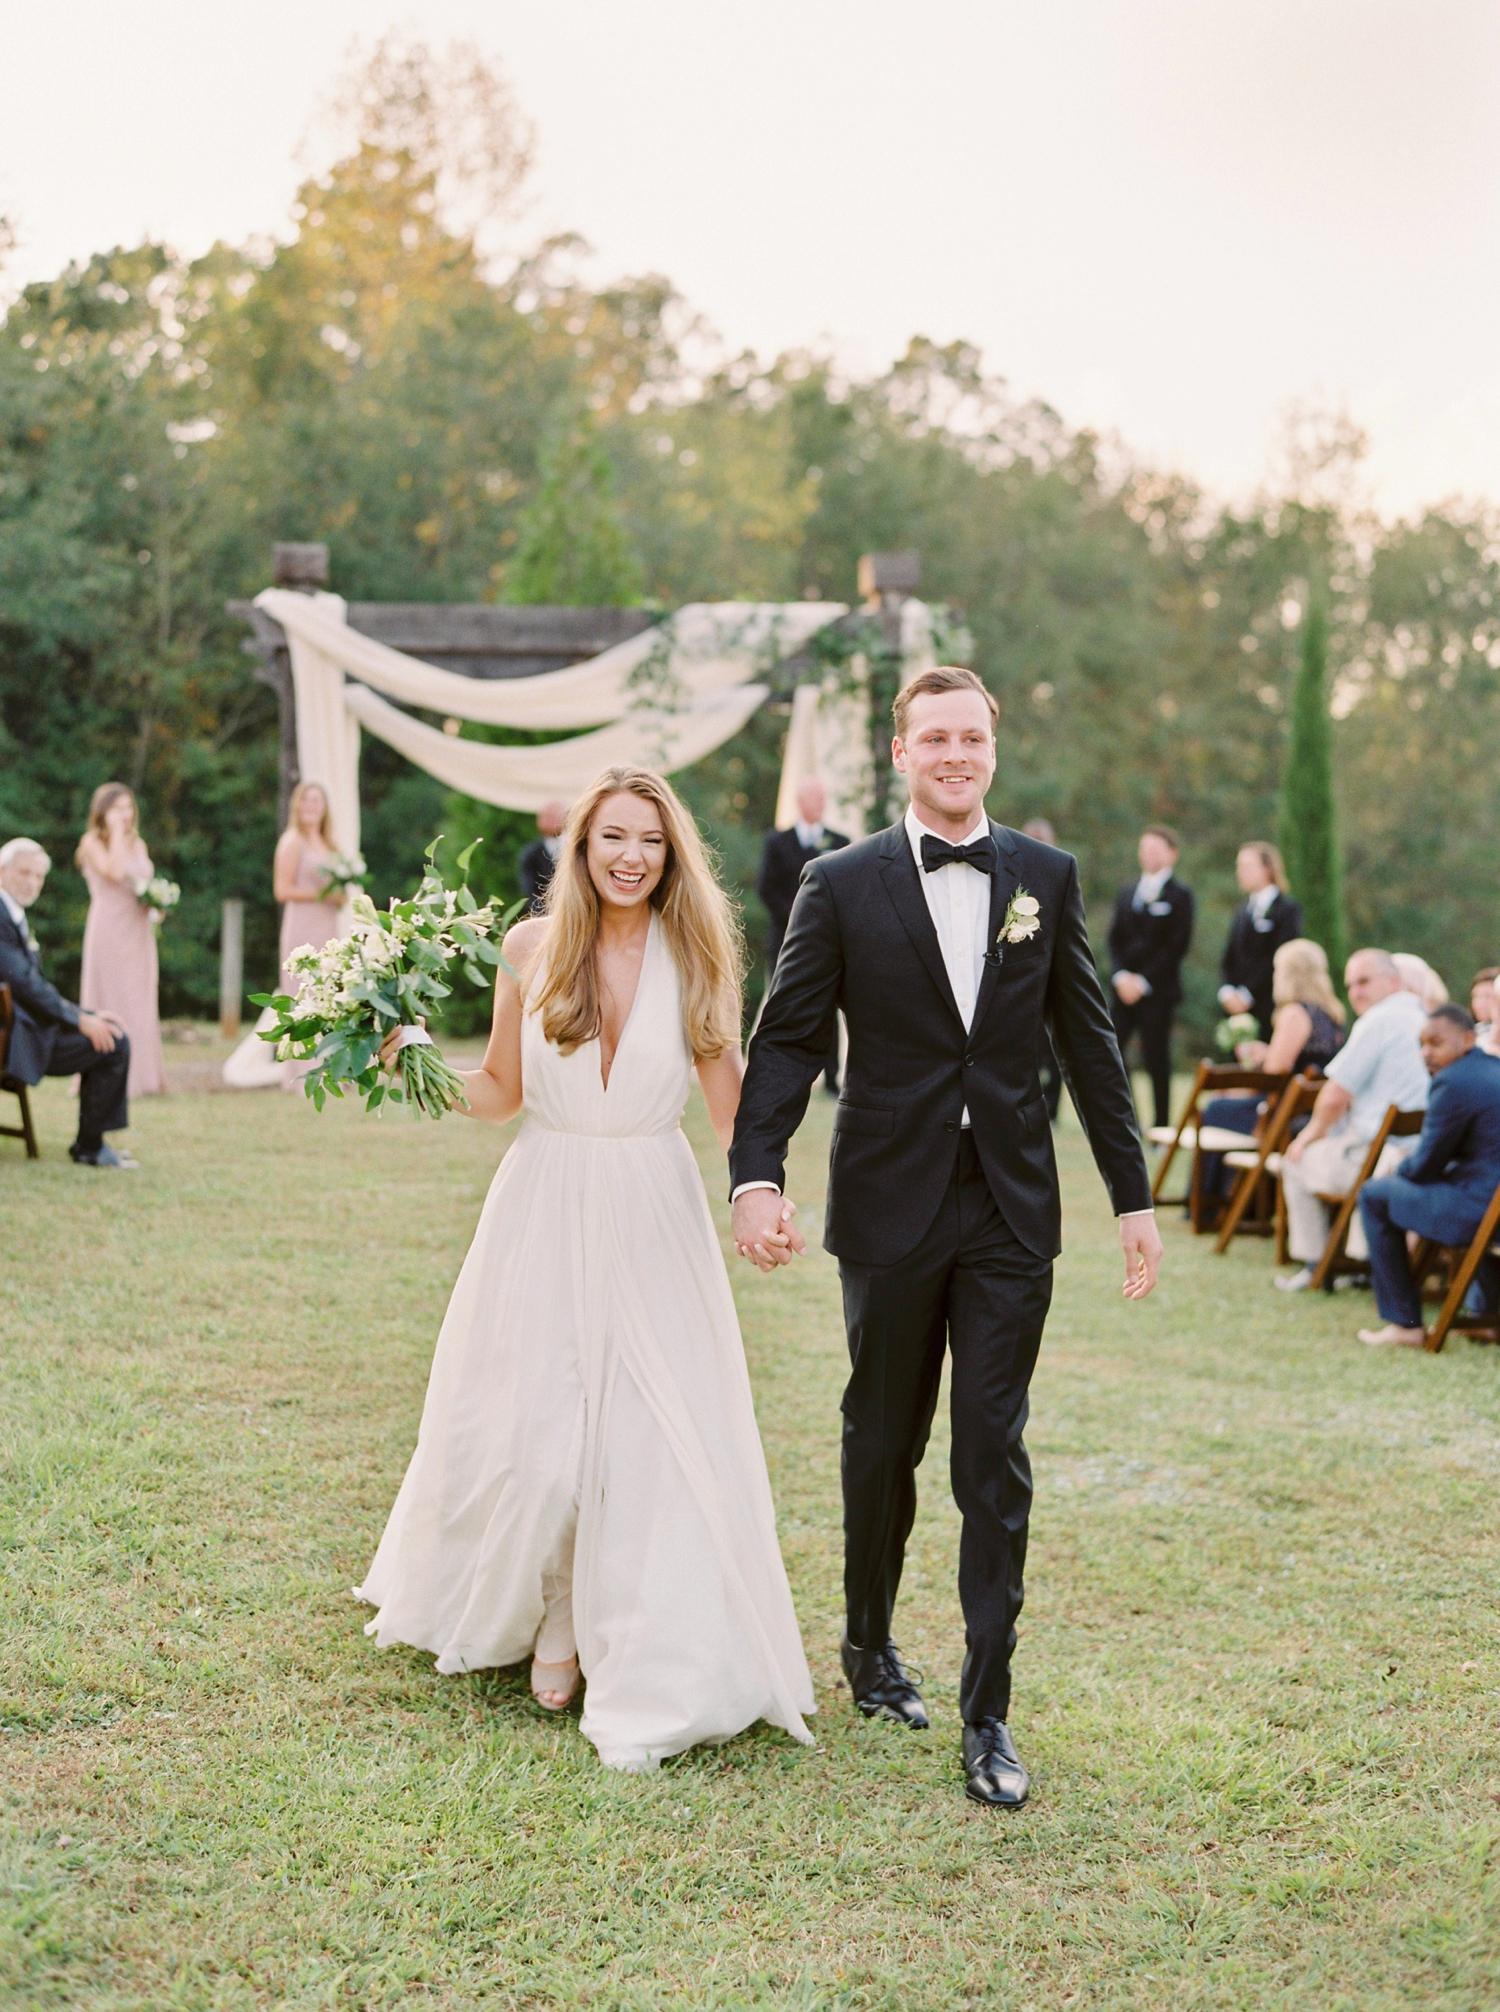 Calgary wedding photographers | georgia wedding photographers | fine art film | Justine Milton Photography | georgia wedding | wedding ceremony | just married